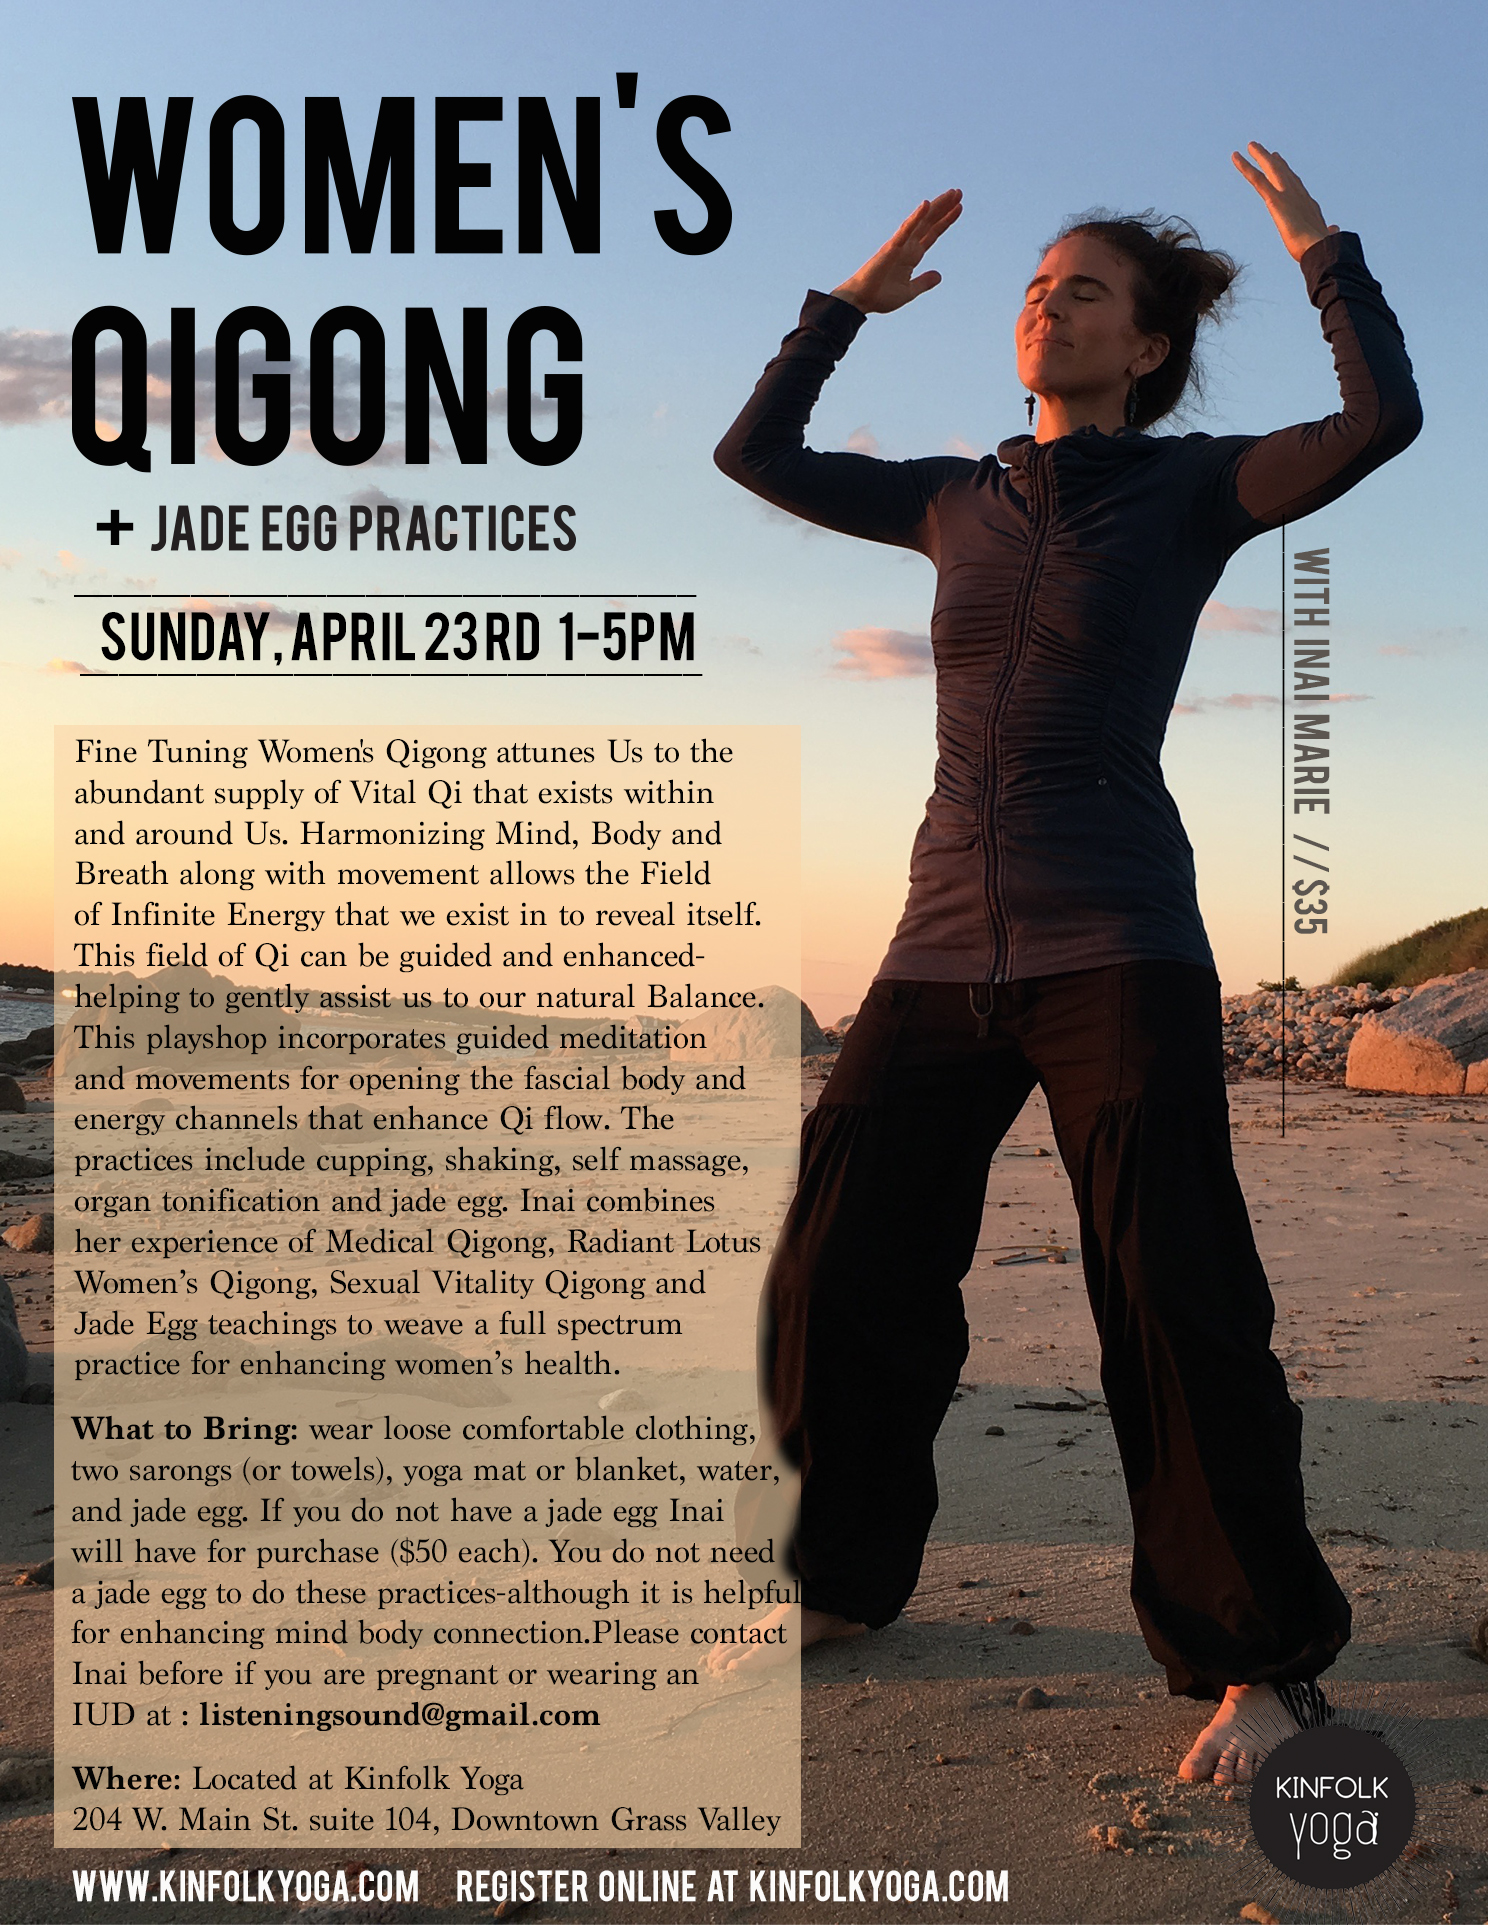 women Qigong jade egg practices kinfolk yoga workshops nevada city